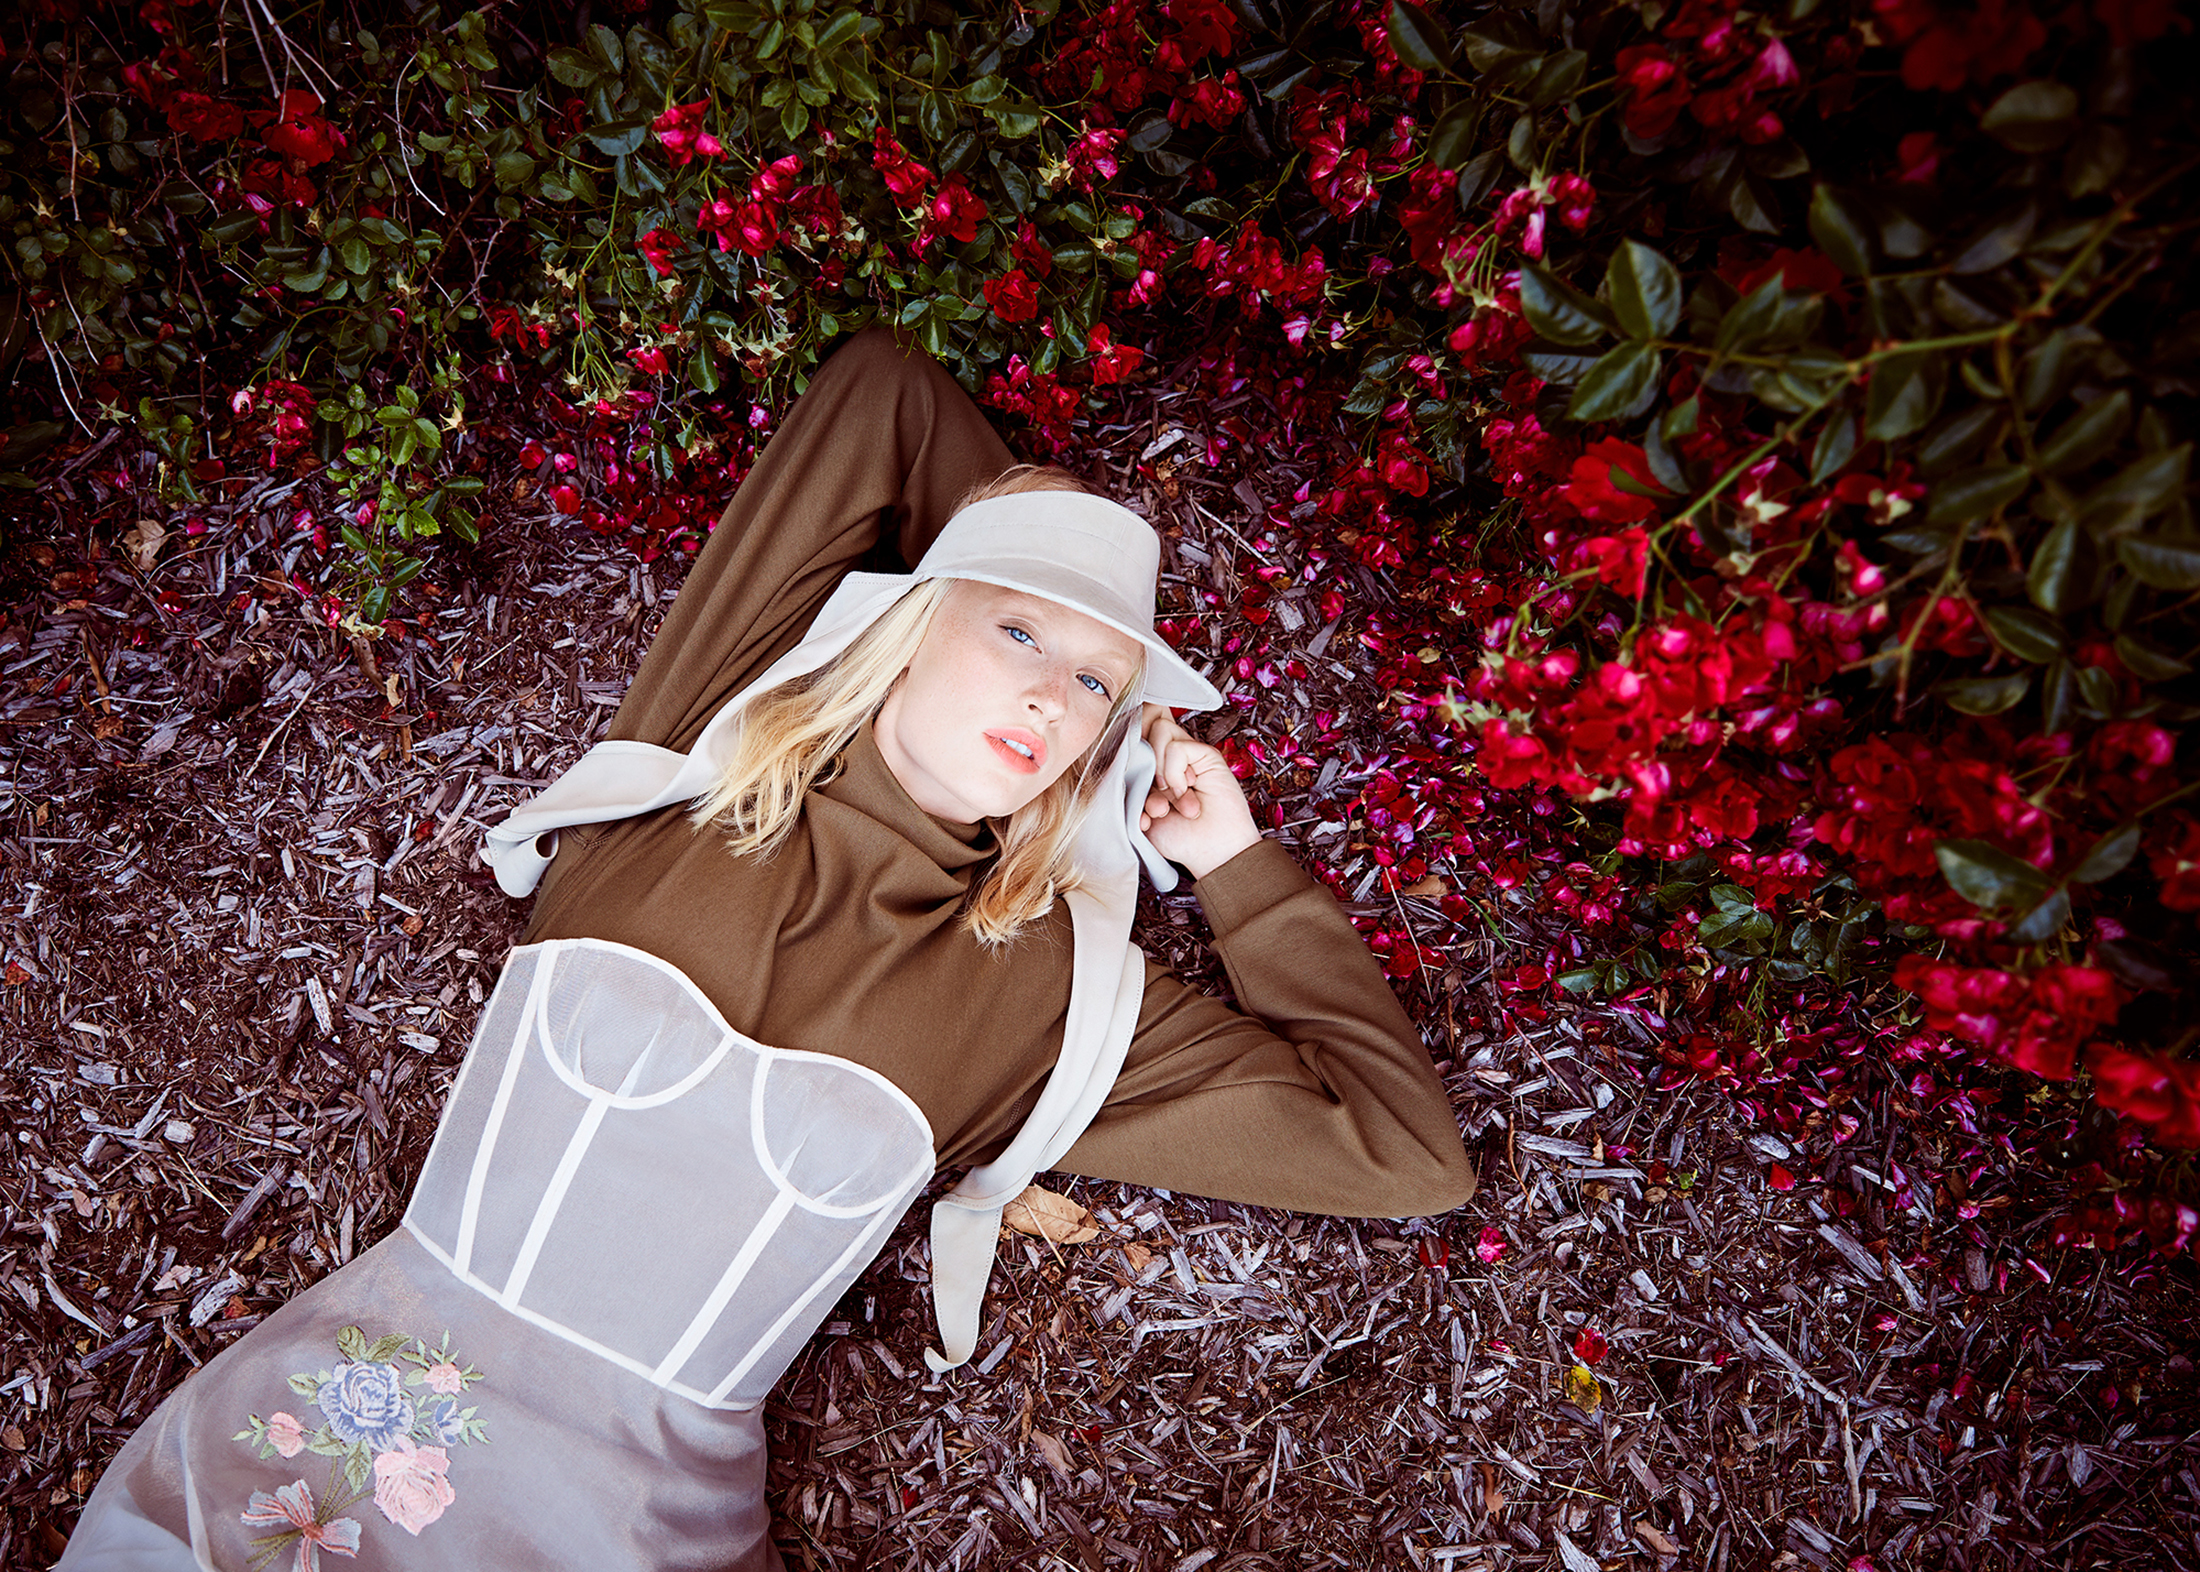 FashionPhotographer_FashionEditorial_By_BriJohnson_00010082.jpg